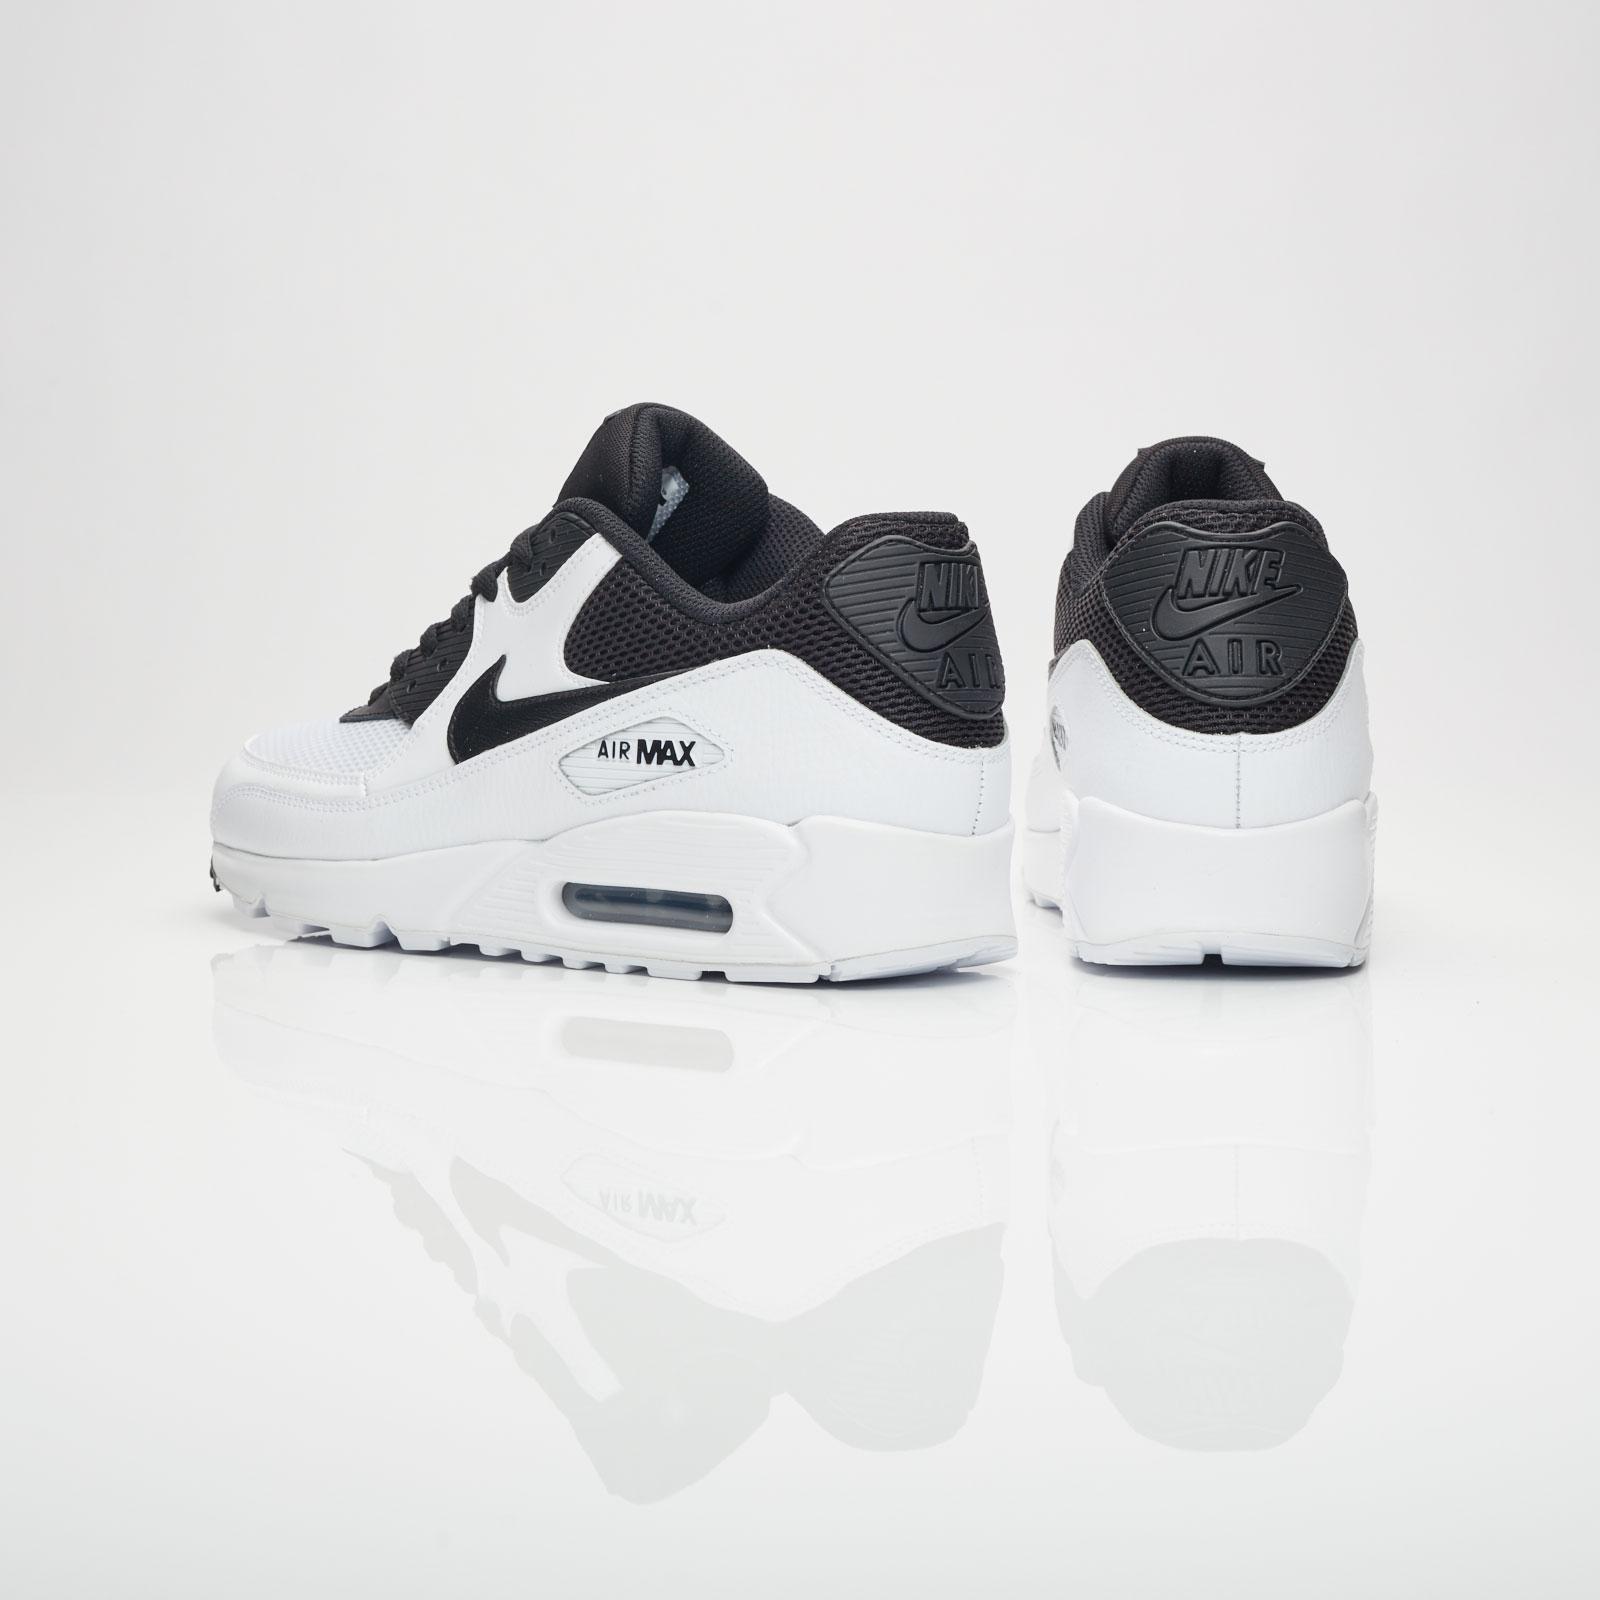 Nike Air Max 90 Essential 537384 041 Sneakersnstuff I